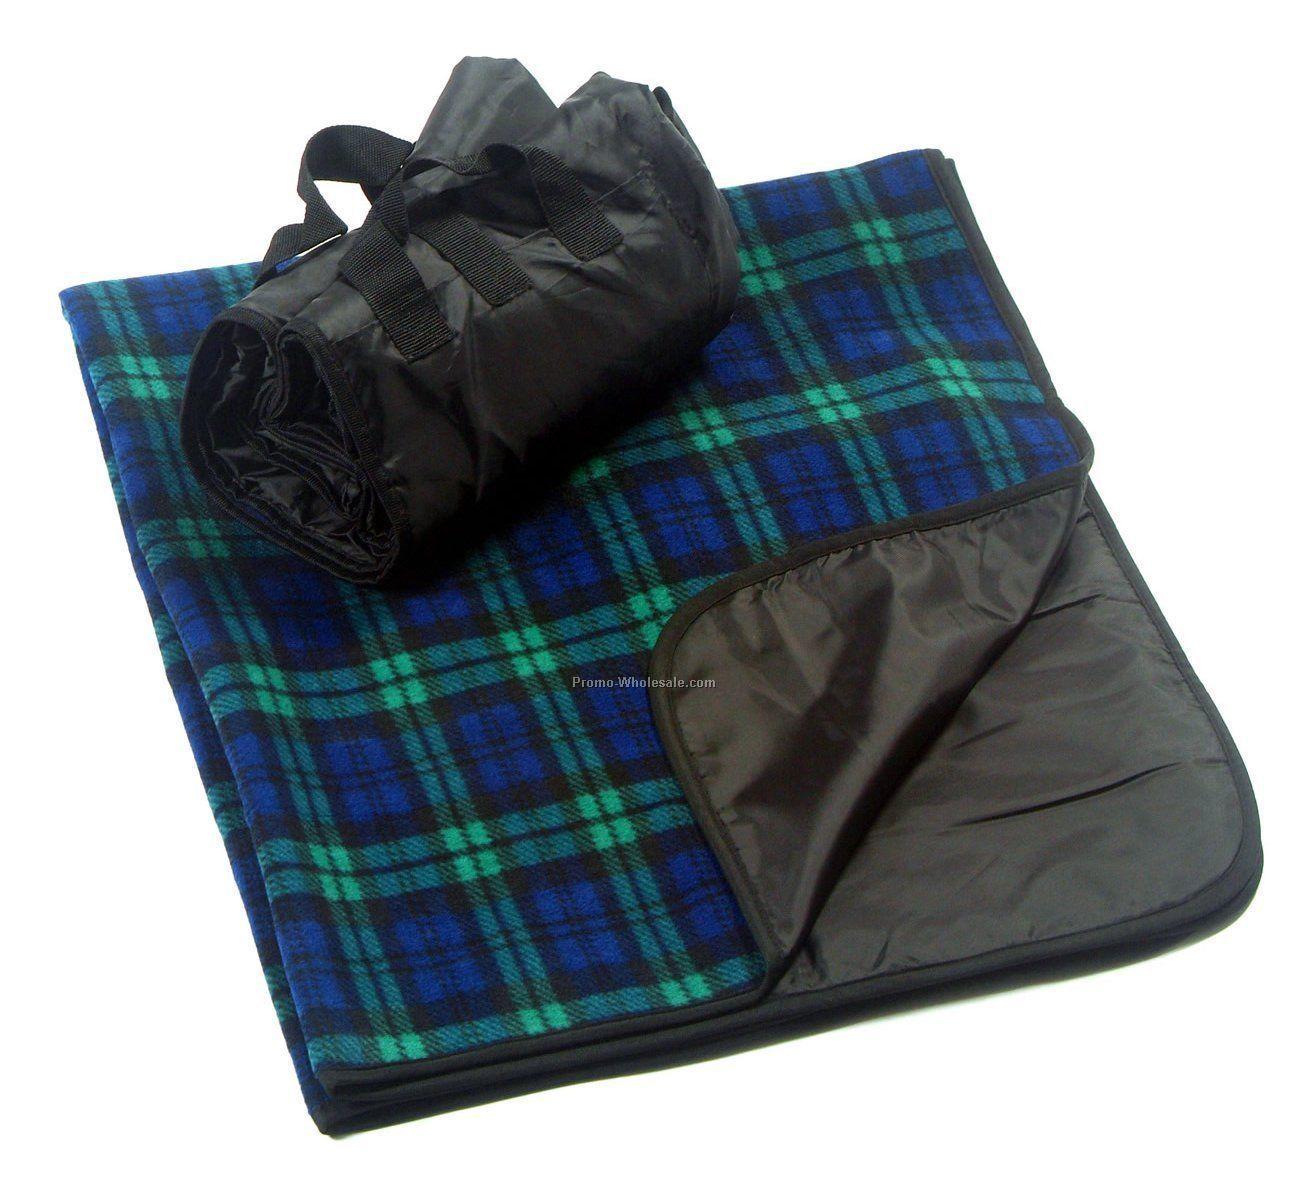 Fleece Picnic Blanket With Nylon Backing - Plaid